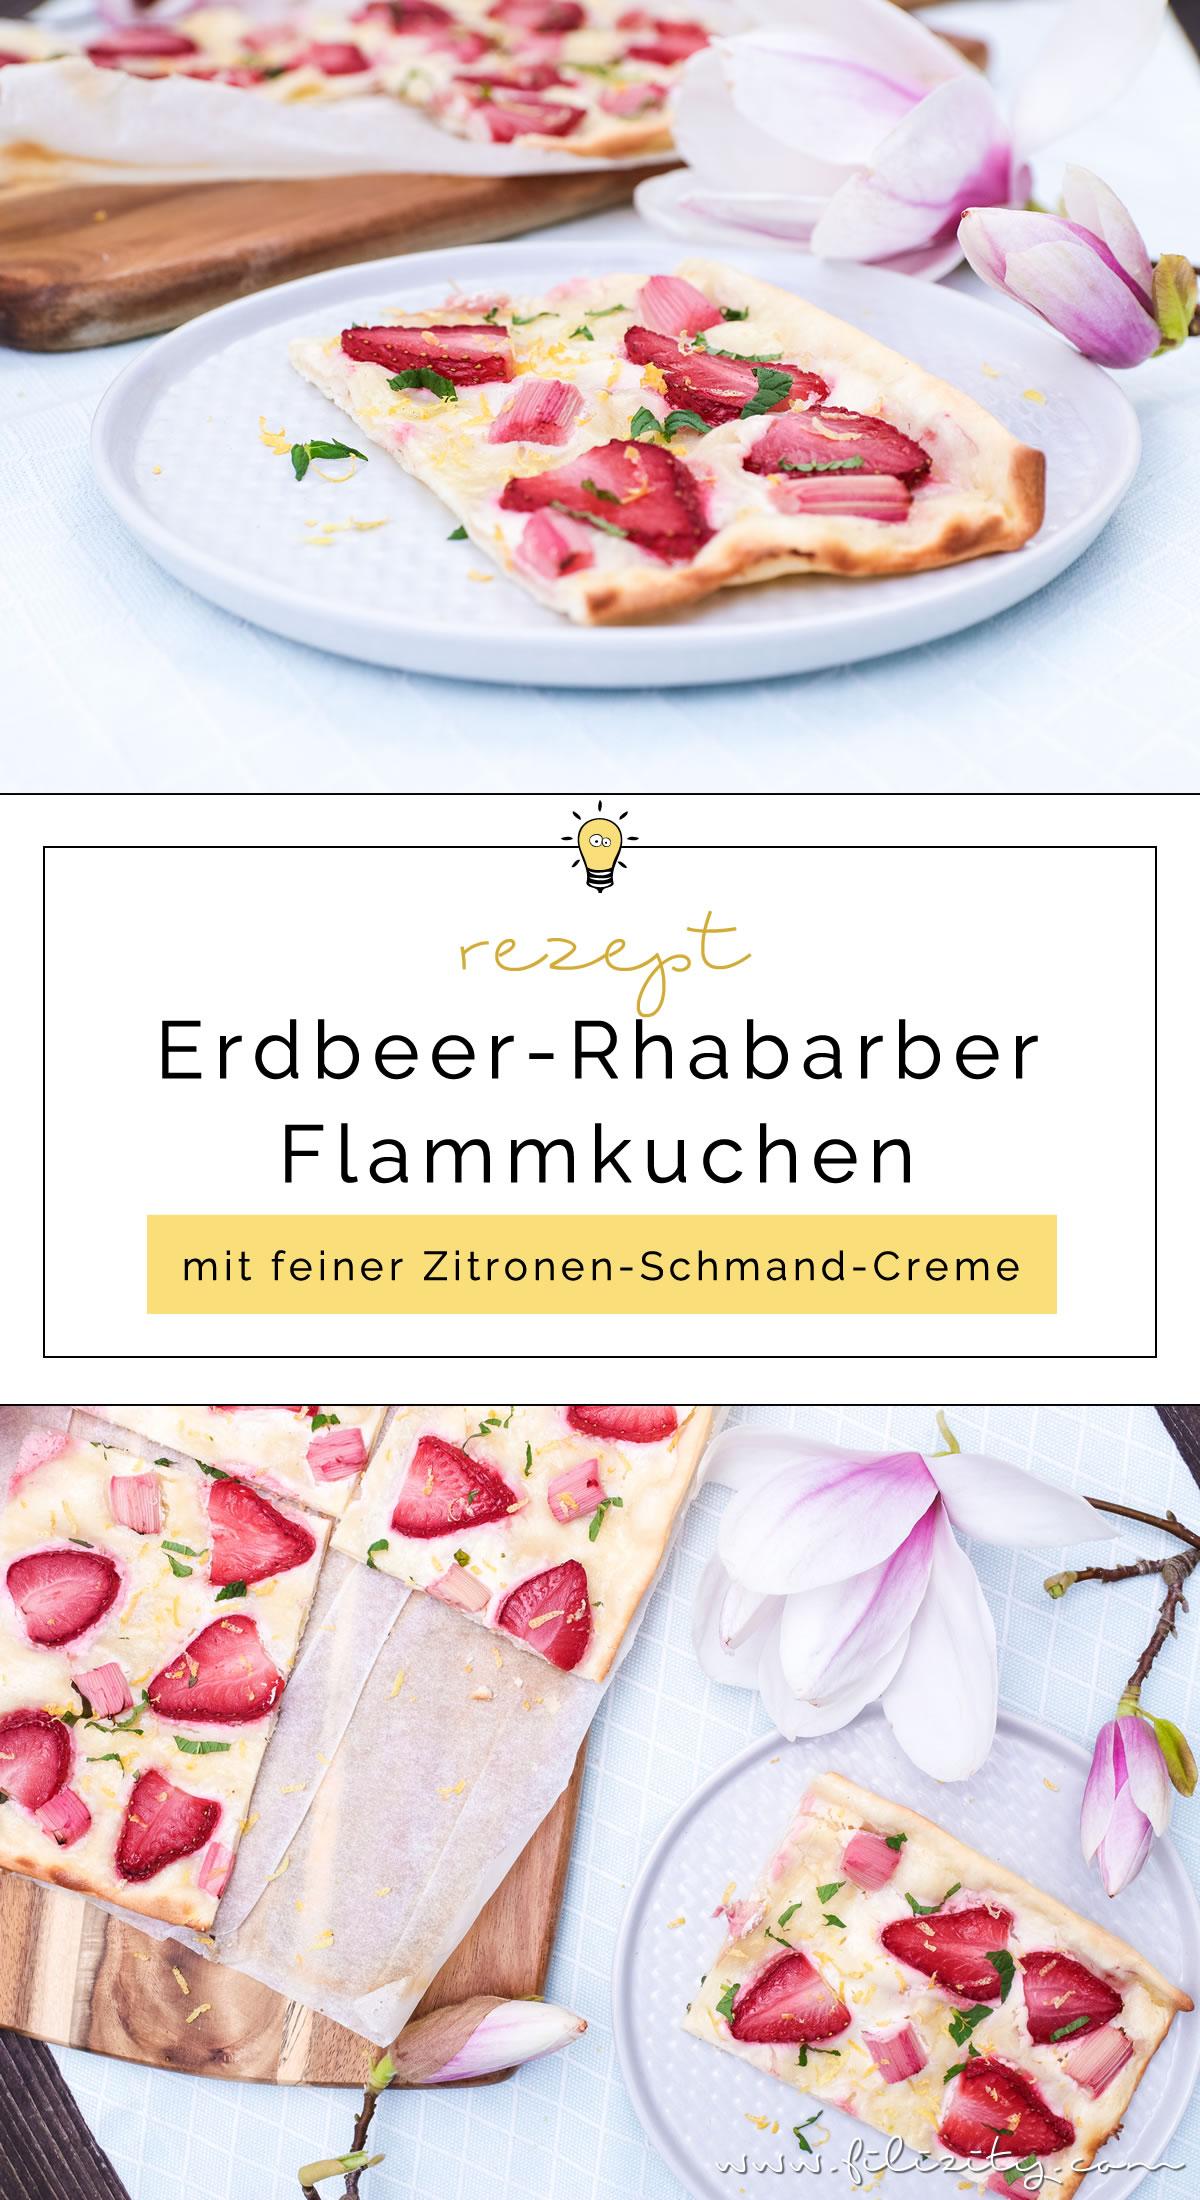 Erdbeer-Rhabarber-Flammkuchen - Schnelles Rezept | Filizity. Kreativmagazin & Food-Blog #rhabarber #flammkuchen #erdbeeren